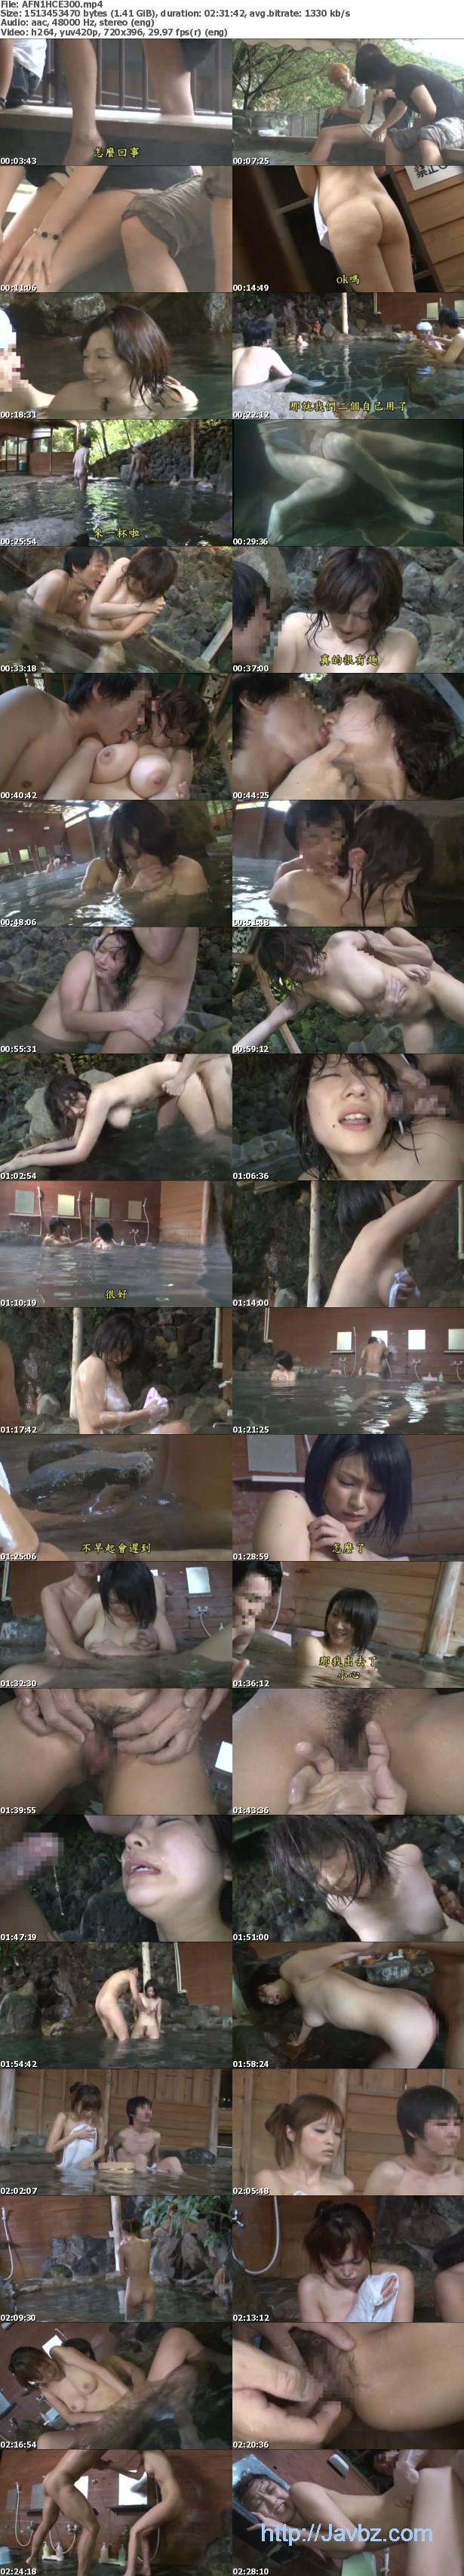 [NHDTA-300] 在混浴溫泉中,男友明明就在附近卻被癡漢弄到爽到不行的巨乳女孩就算被侵犯也不會拒絕[中文字幕]